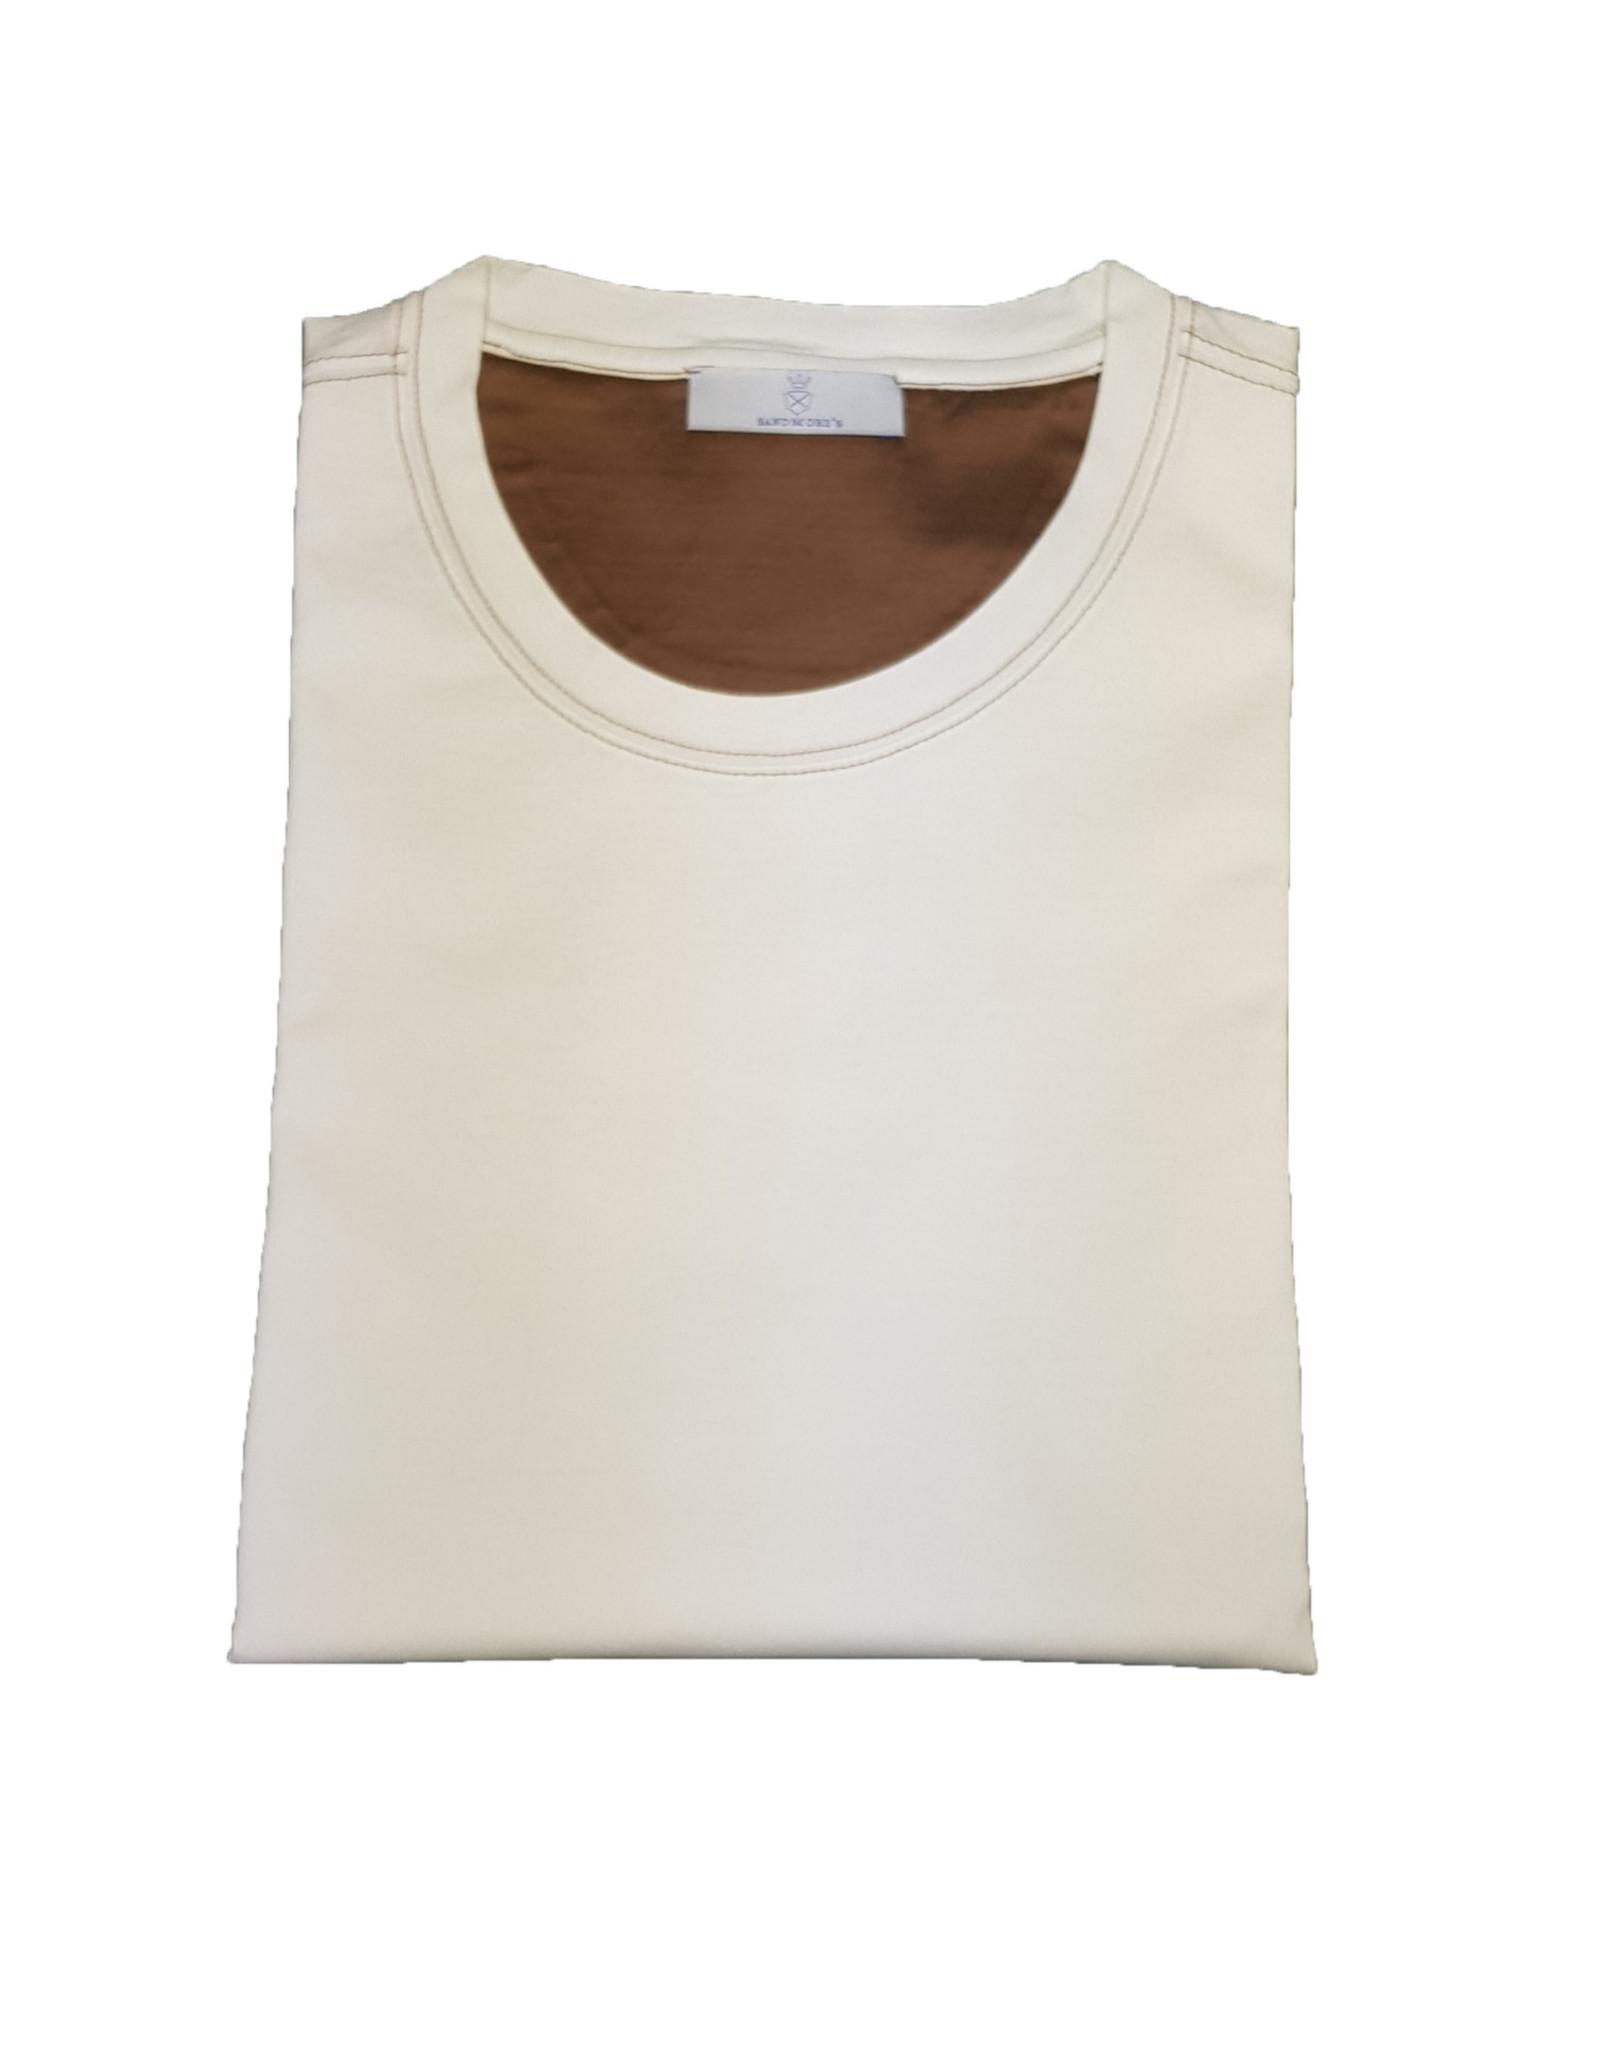 Gran Sasso Sandmore's t-shirt ecru 73727/005 M:60138